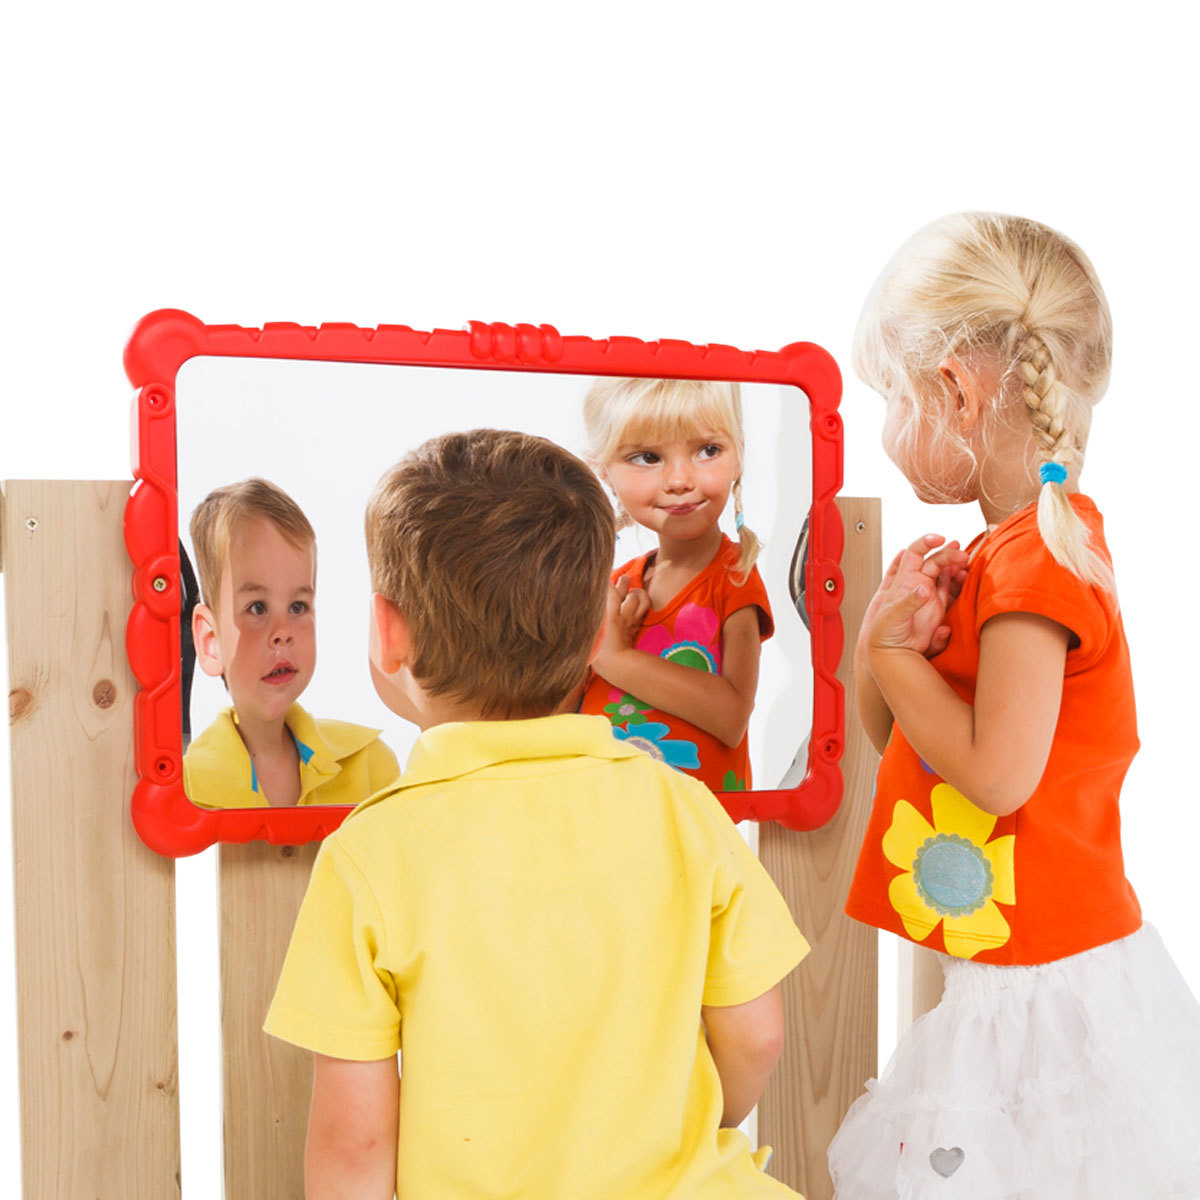 Кривое зеркало, зеркало смеха